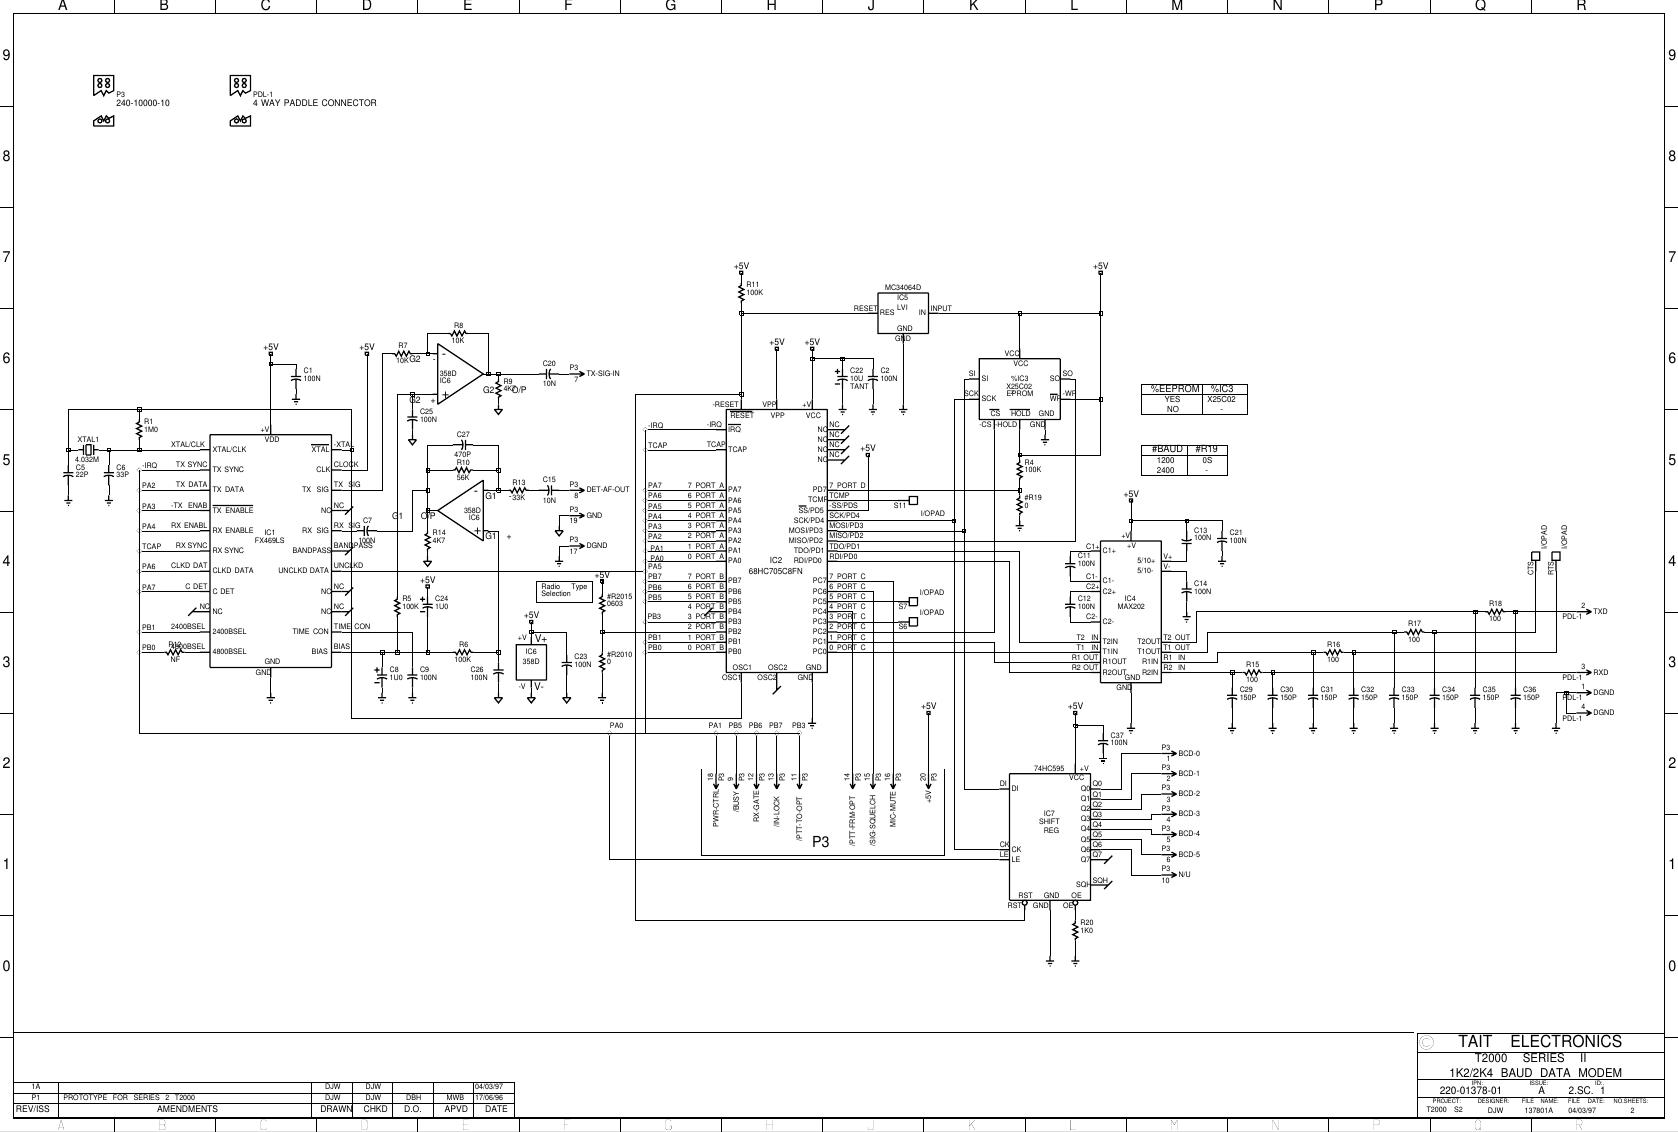 Modem Circuit Diagram / Internal Modem Schematics